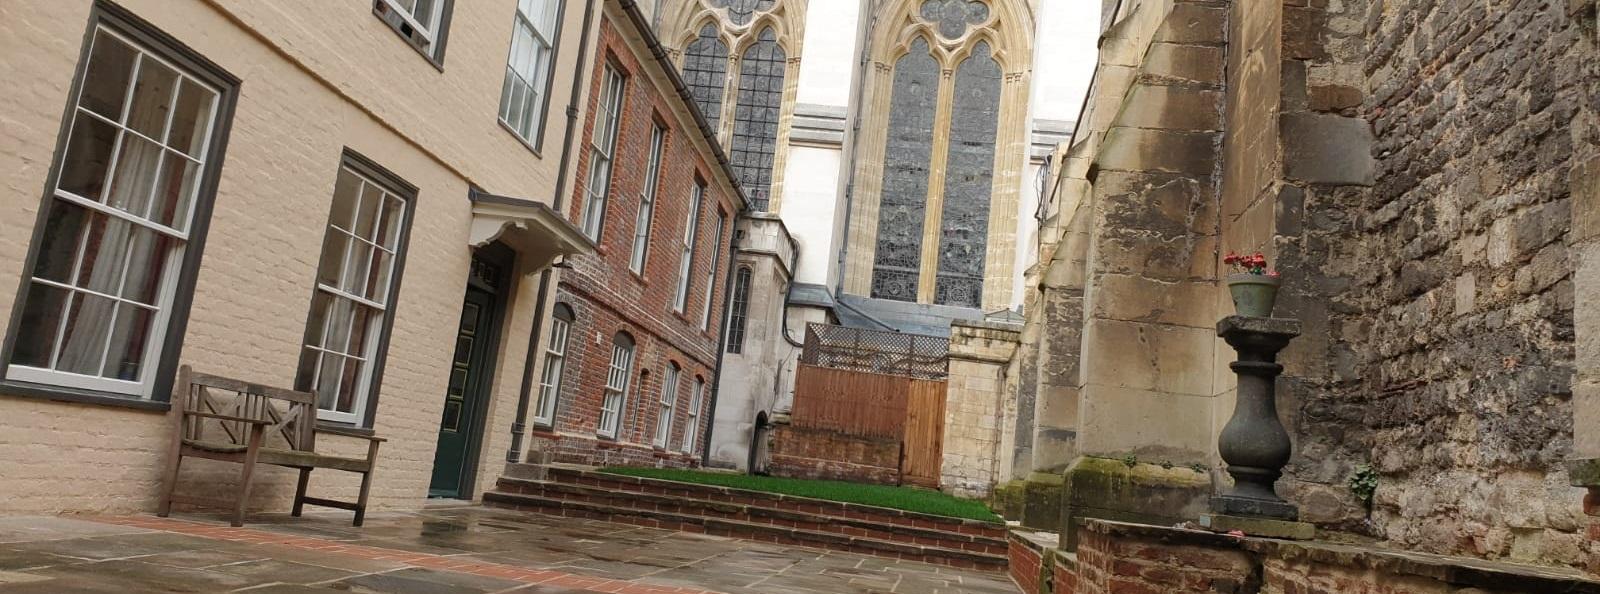 Westminster Deanery Refurbishment